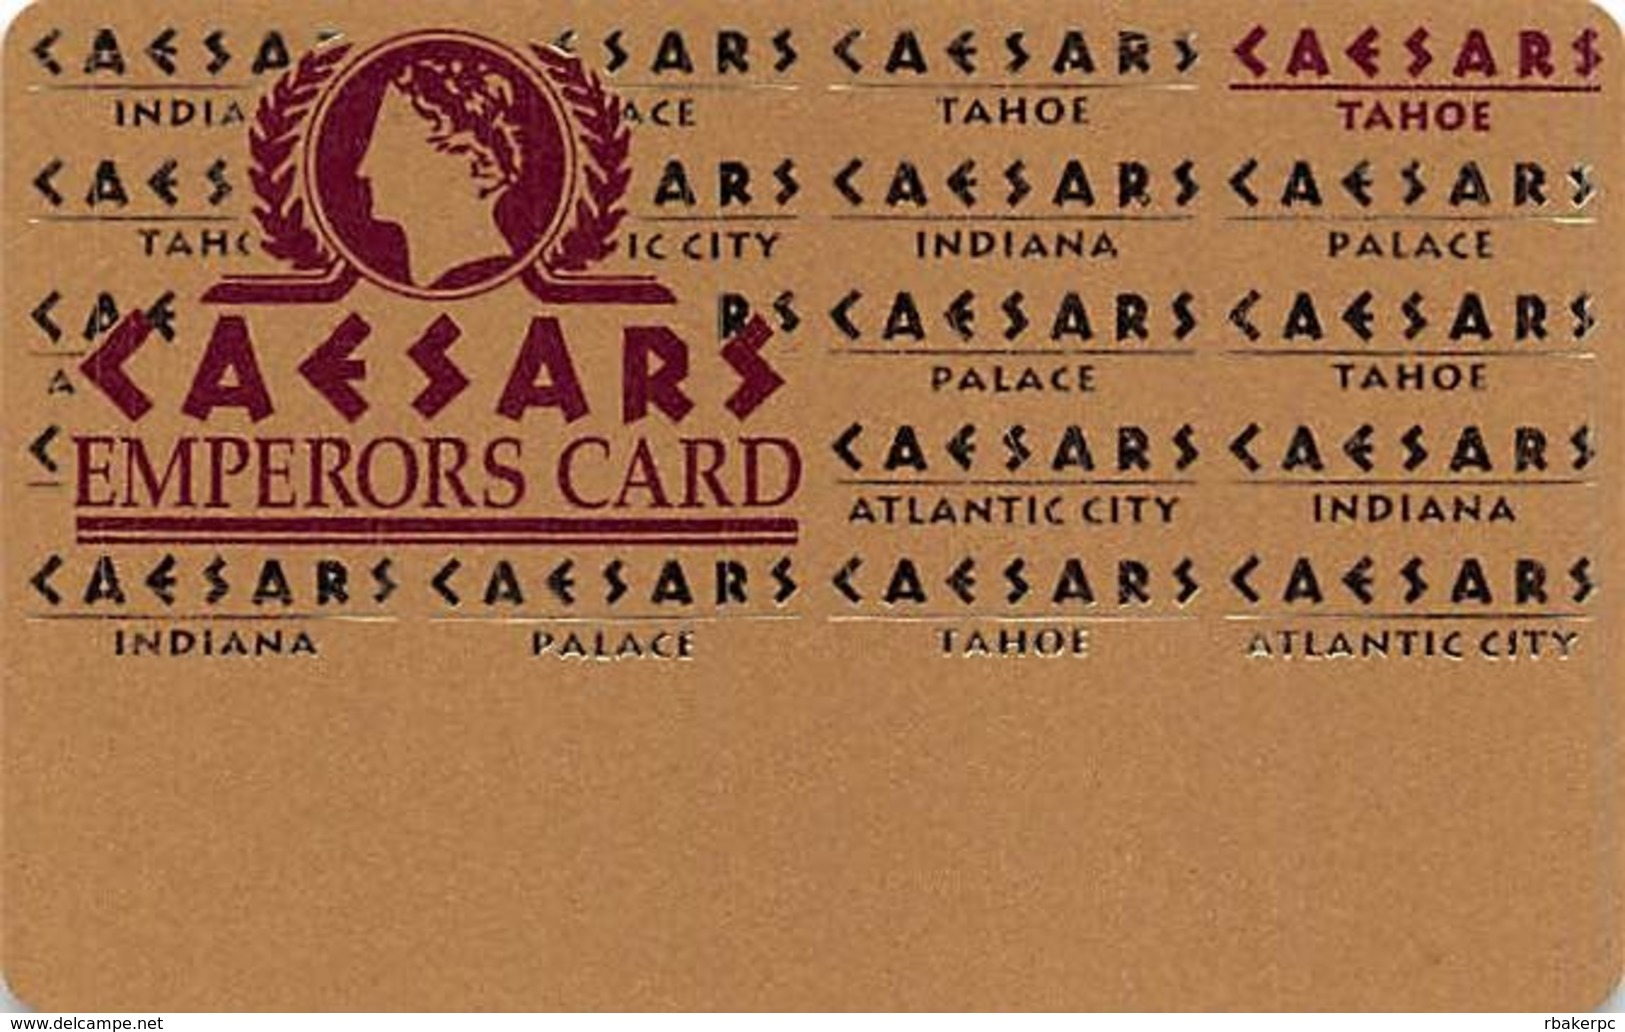 Caesars Casino Lake Tahoe, NV BLANK Slot Card - 5 Line Pattern - Cpi 2001799 Over Mag Stripe - Casinokarten